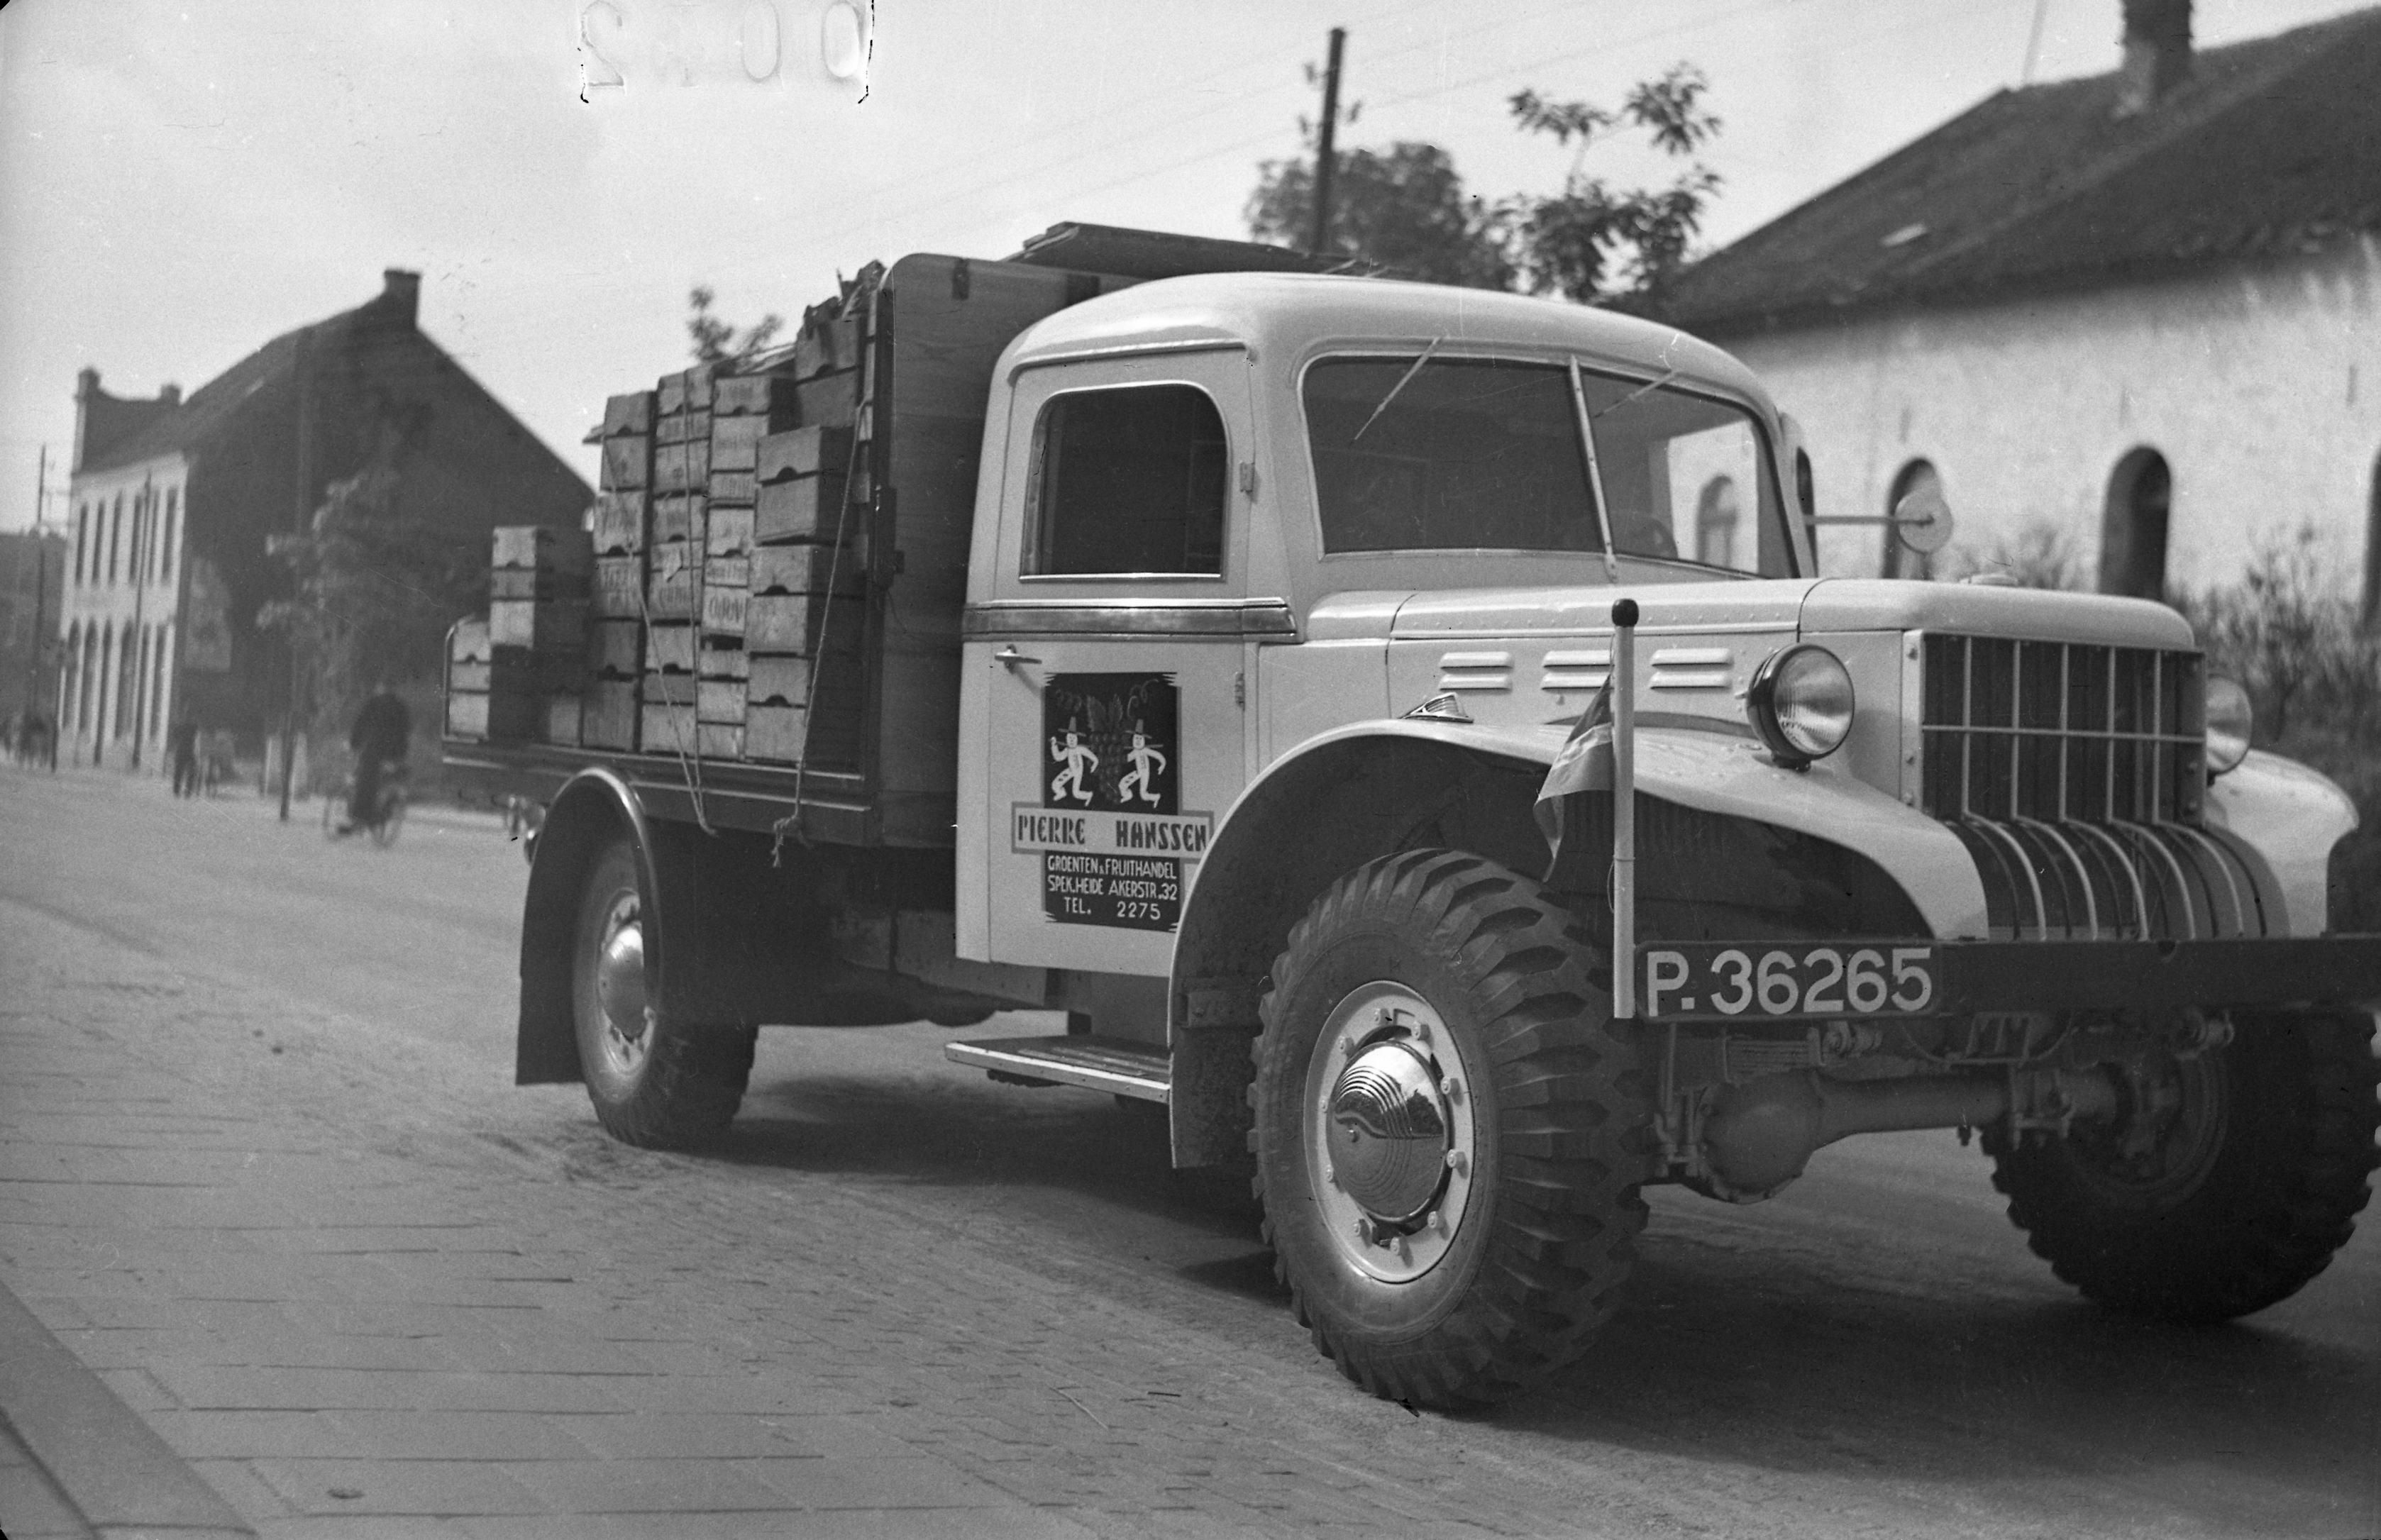 Pierre-Hanssen-Spekholzerheide-Dodge-Beep-WC-Weapon-Carrier-51-archief-zoon-Herman